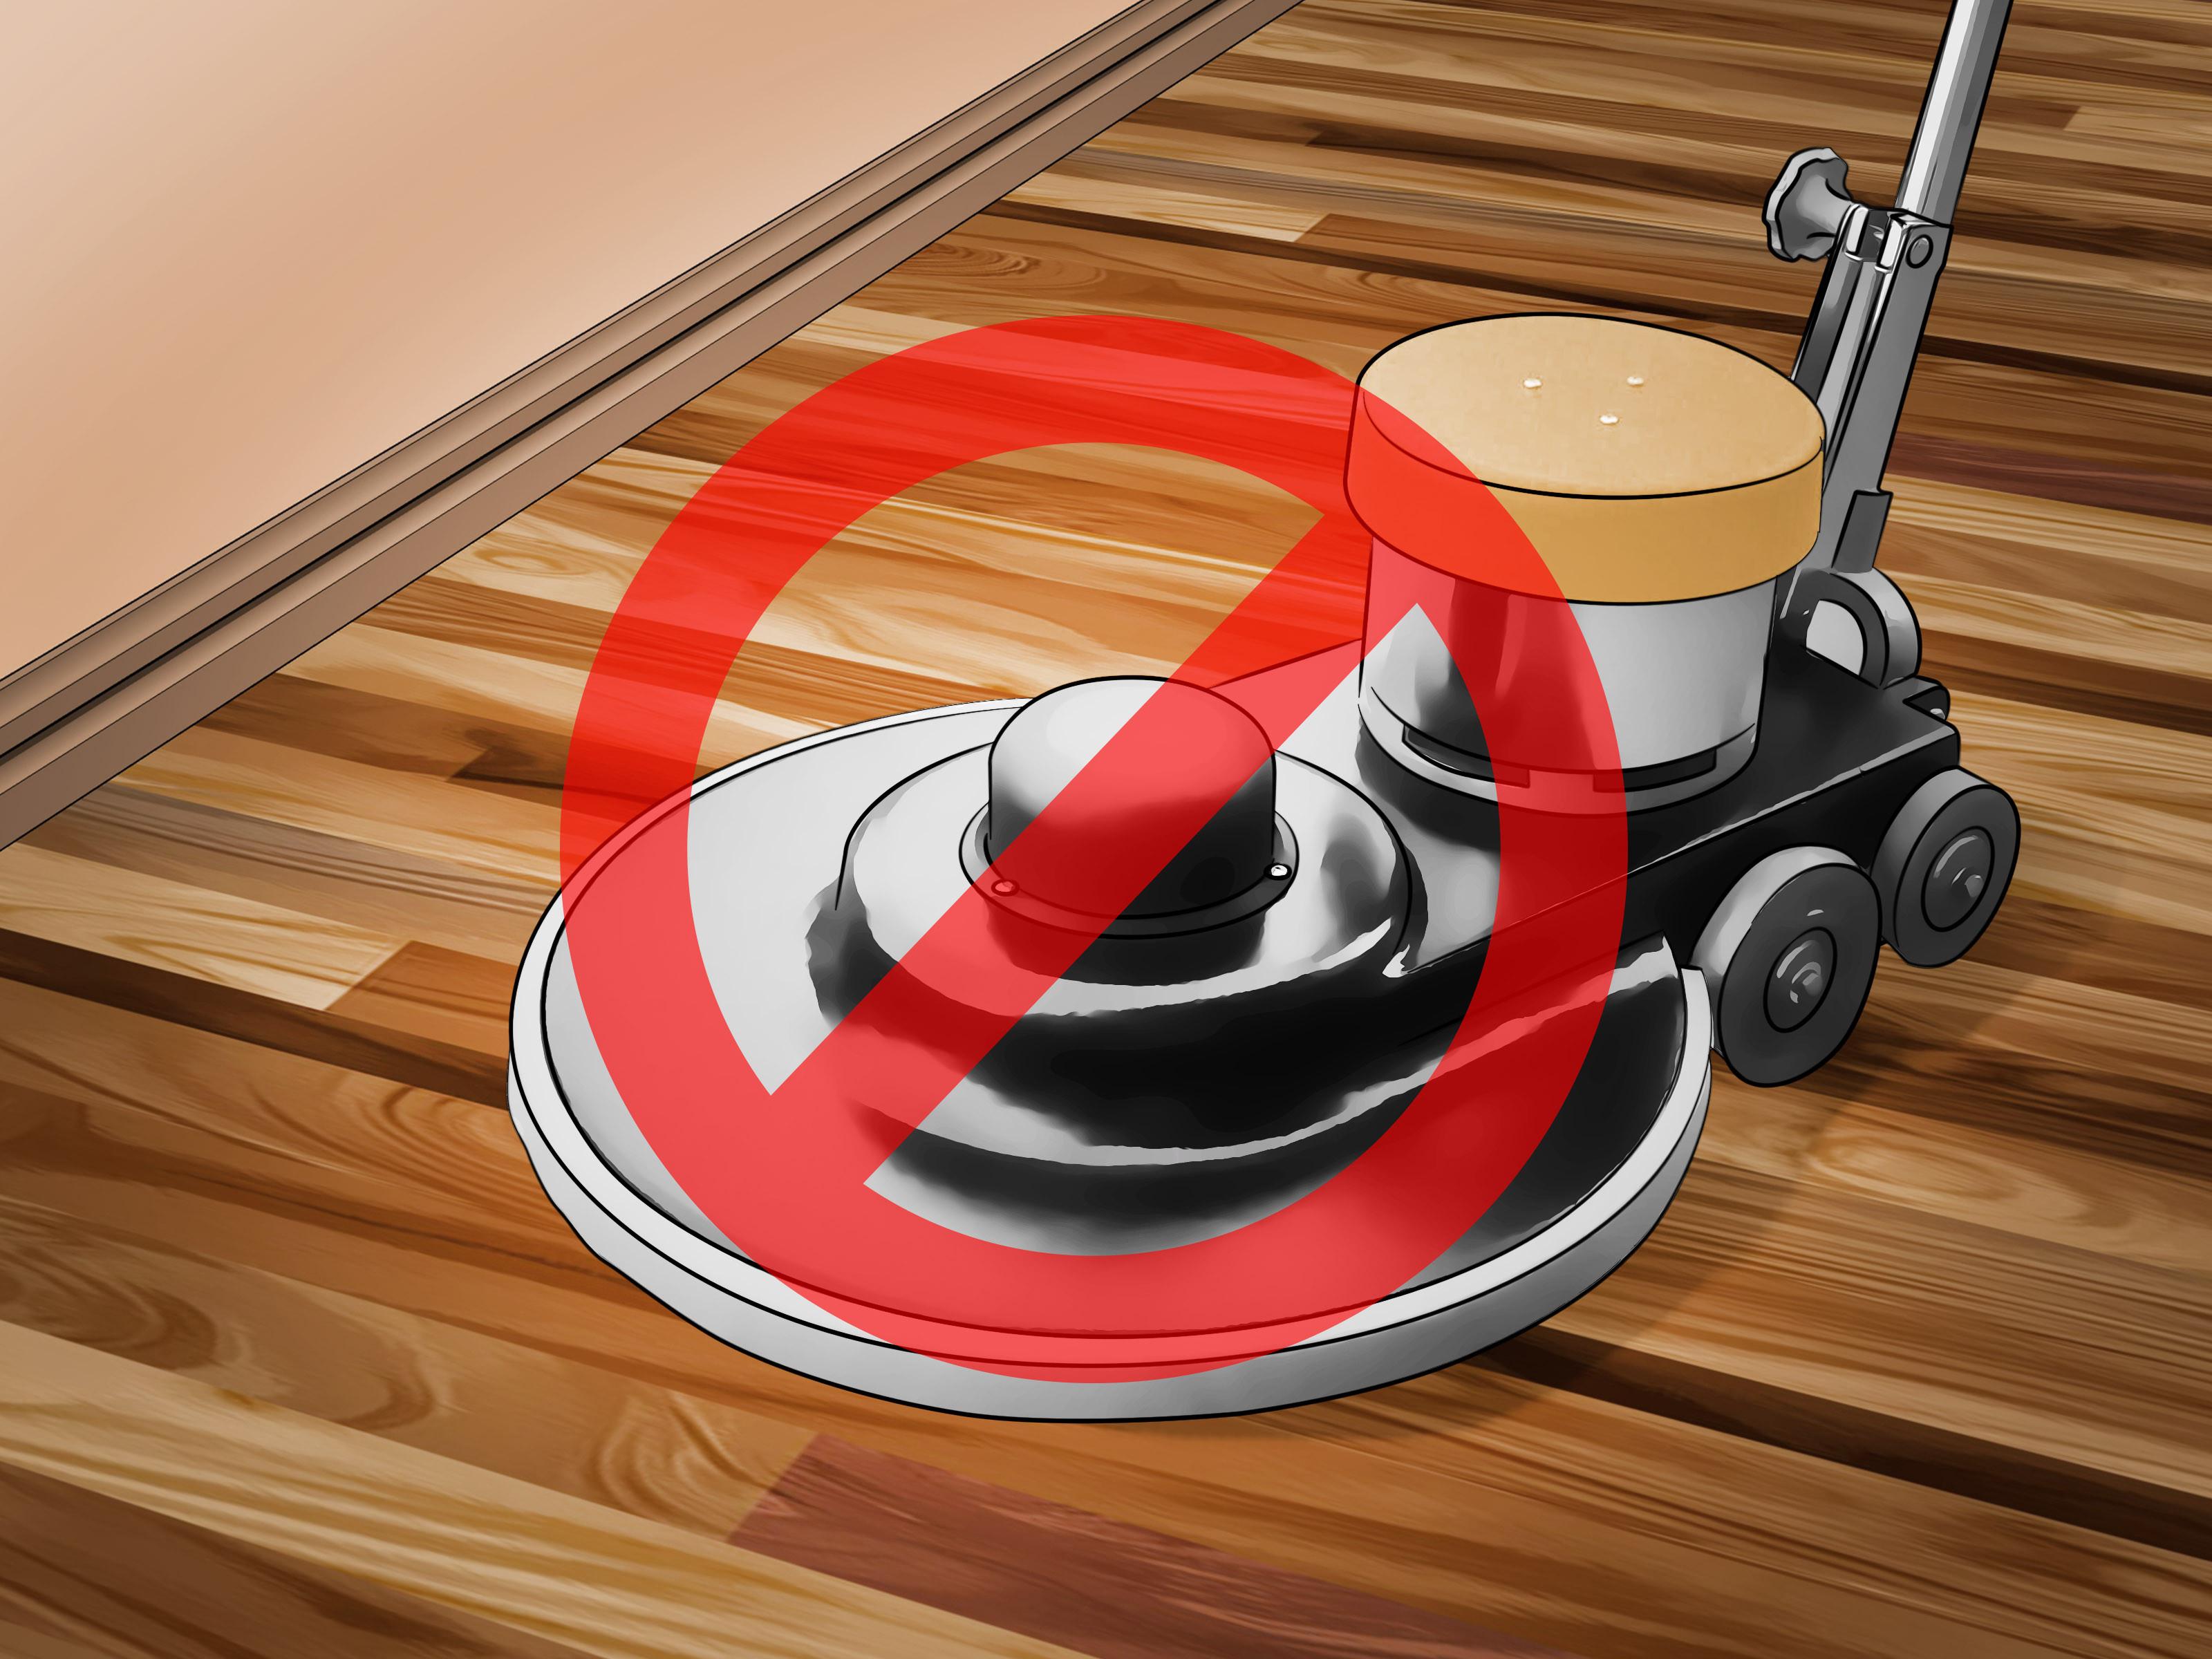 bona ultimate hardwood floor care system reviews of 4 ways to clean polyurethane wood floors wikihow in clean polyurethane wood floors step 15